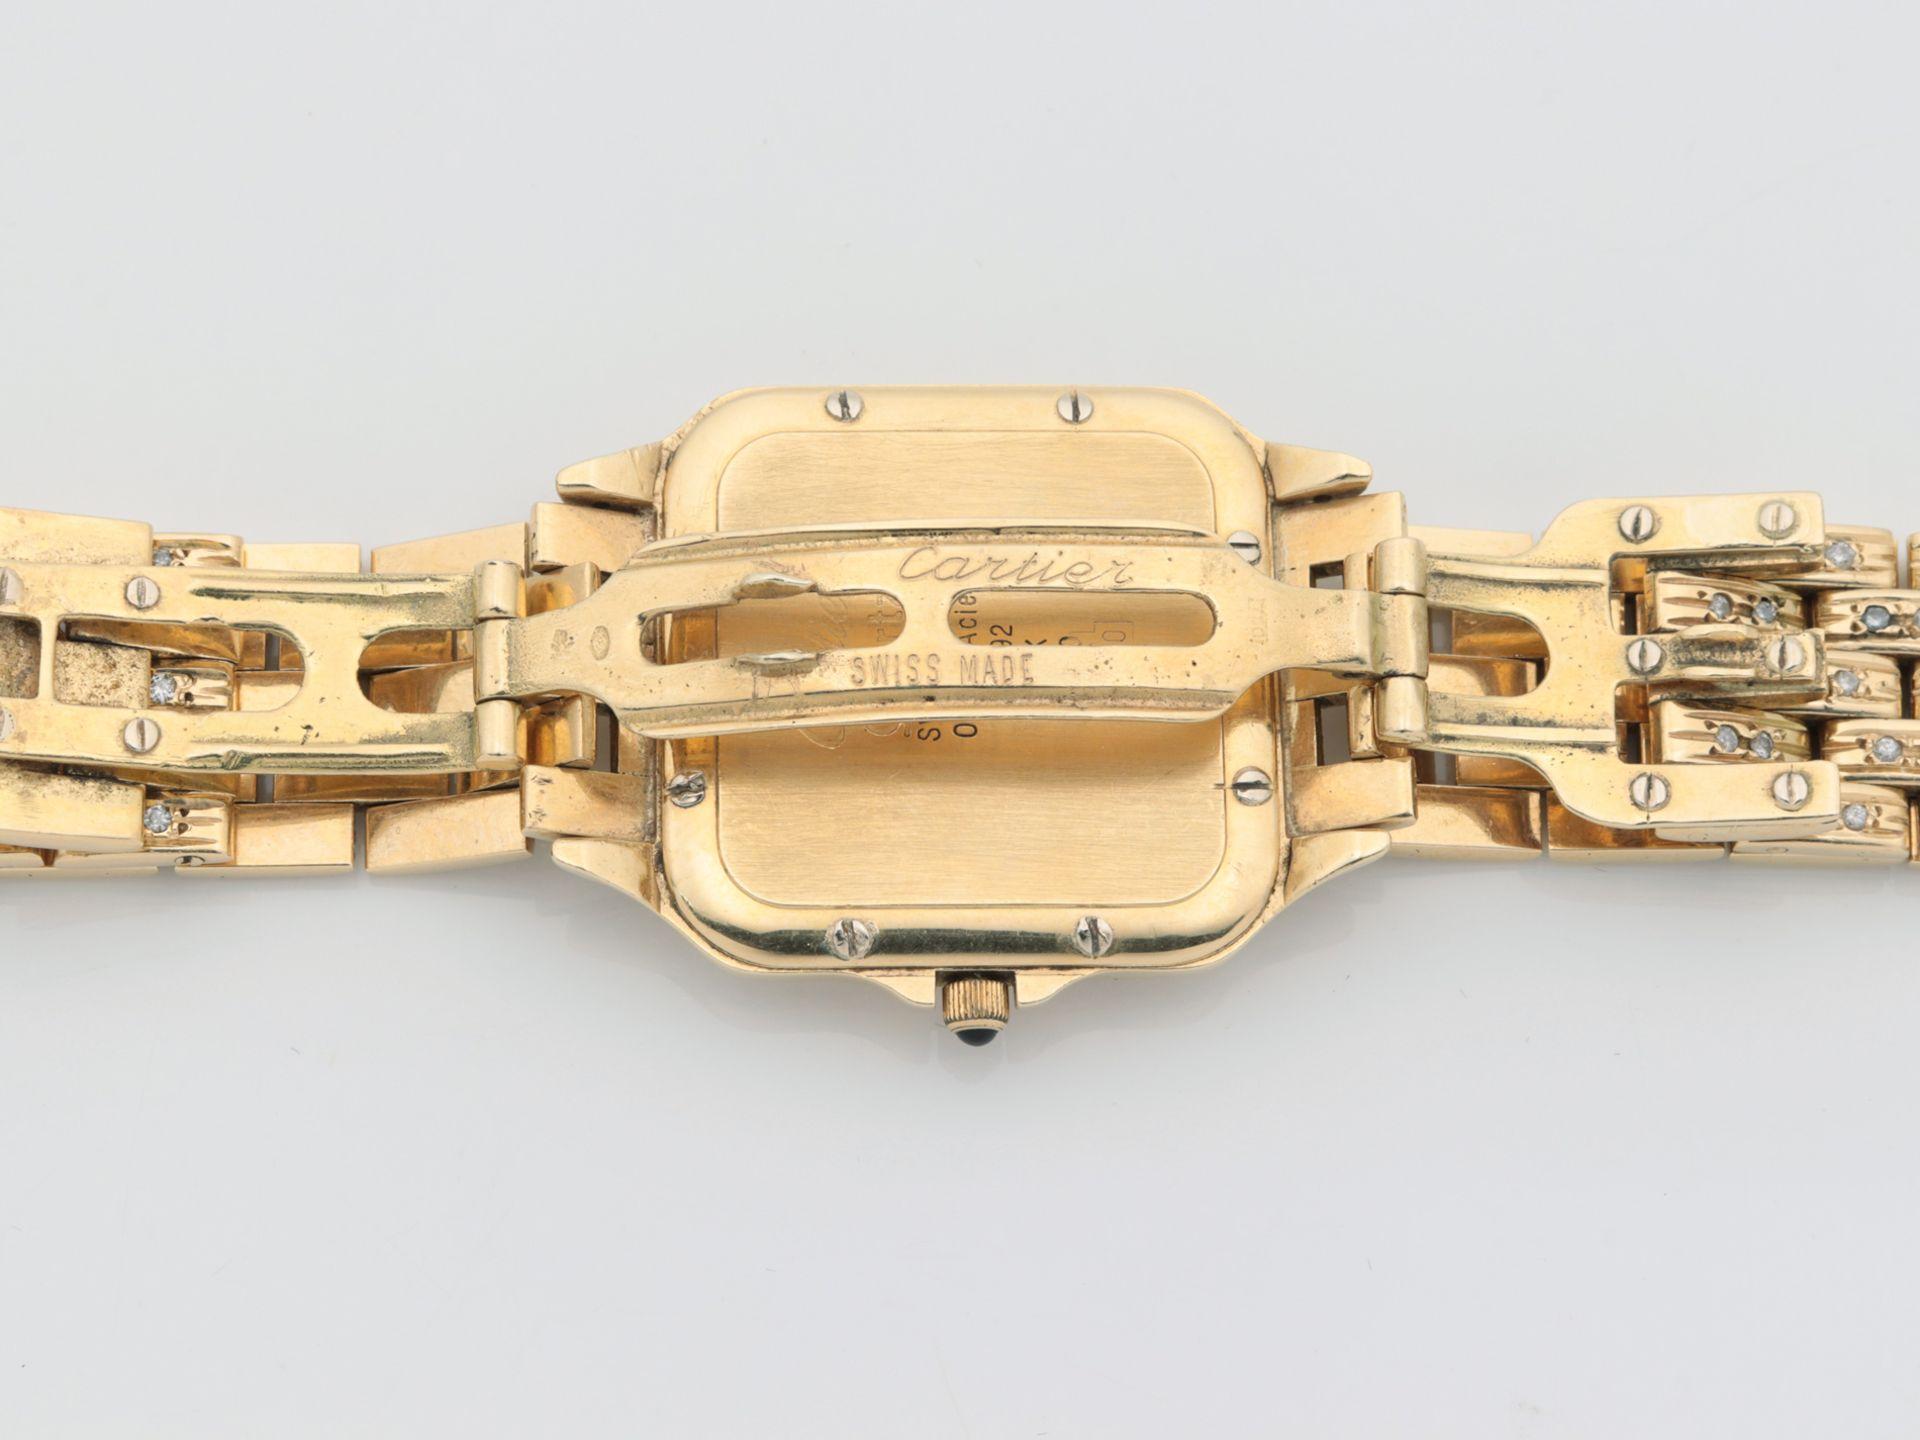 Cartier - Damenarmbanduhr - Image 8 of 14